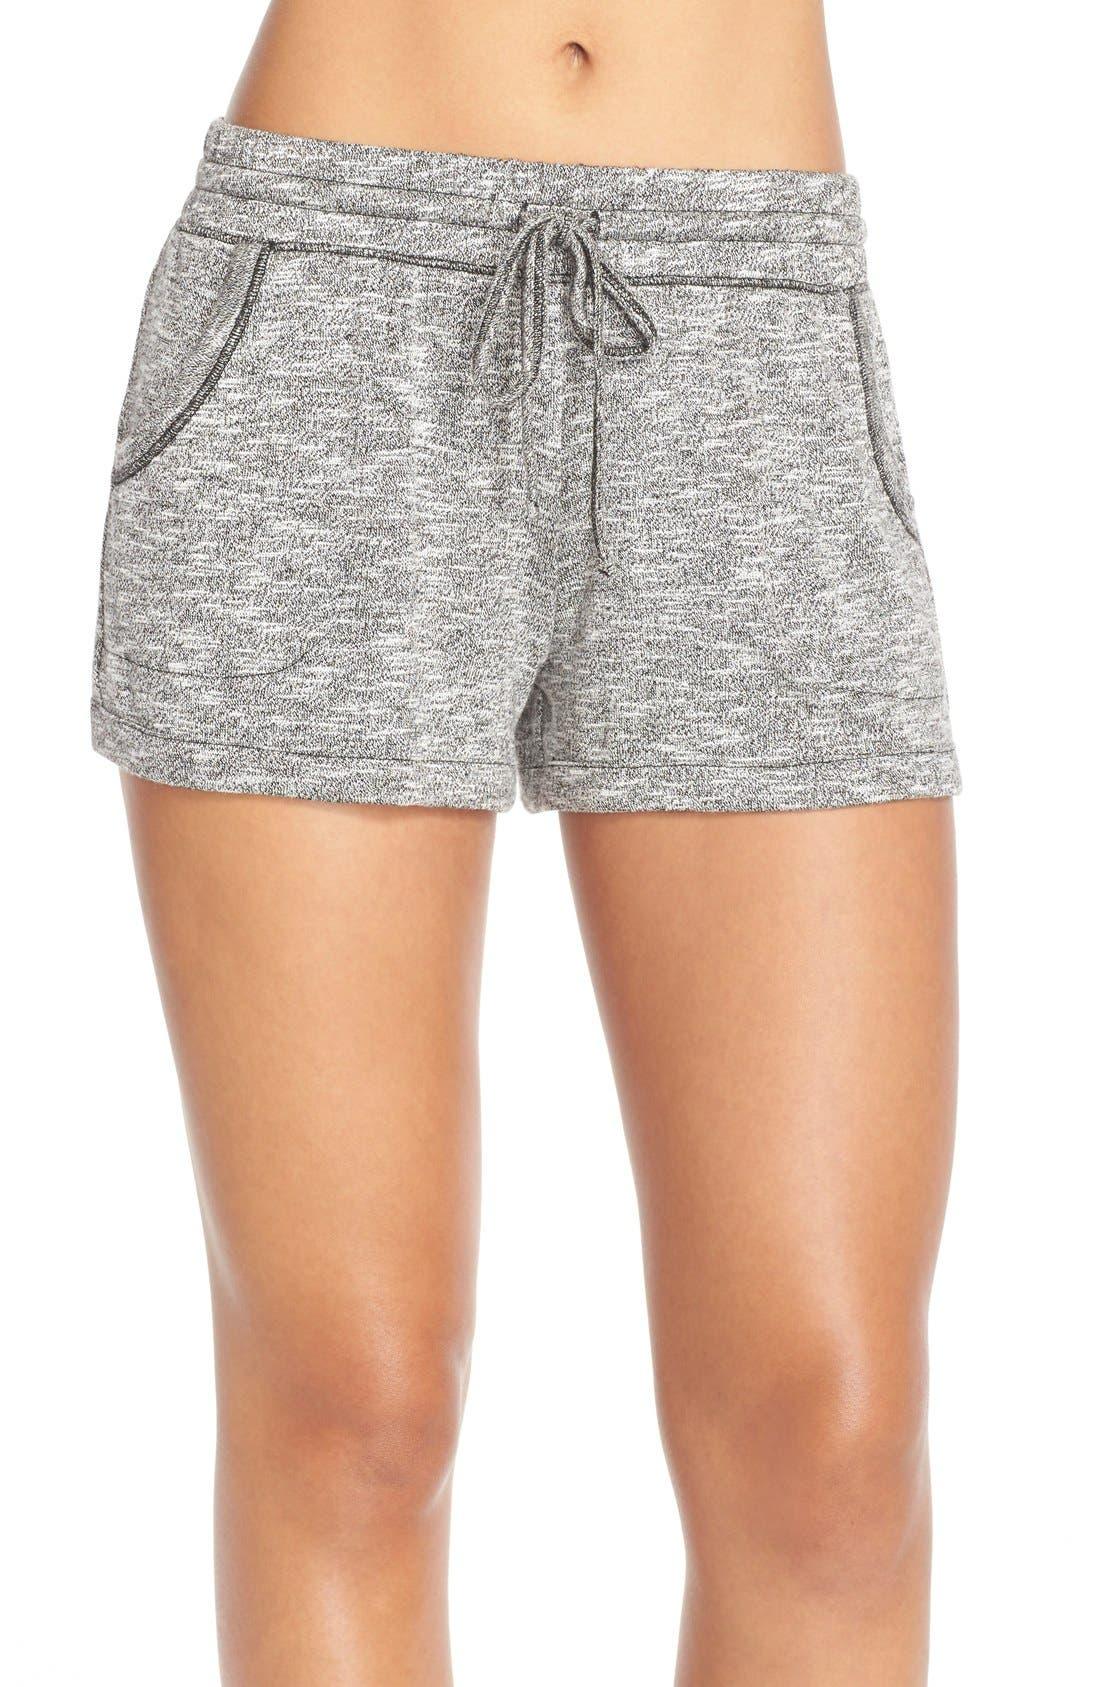 Alternate Image 1 Selected - kensieKnitLounge Shorts